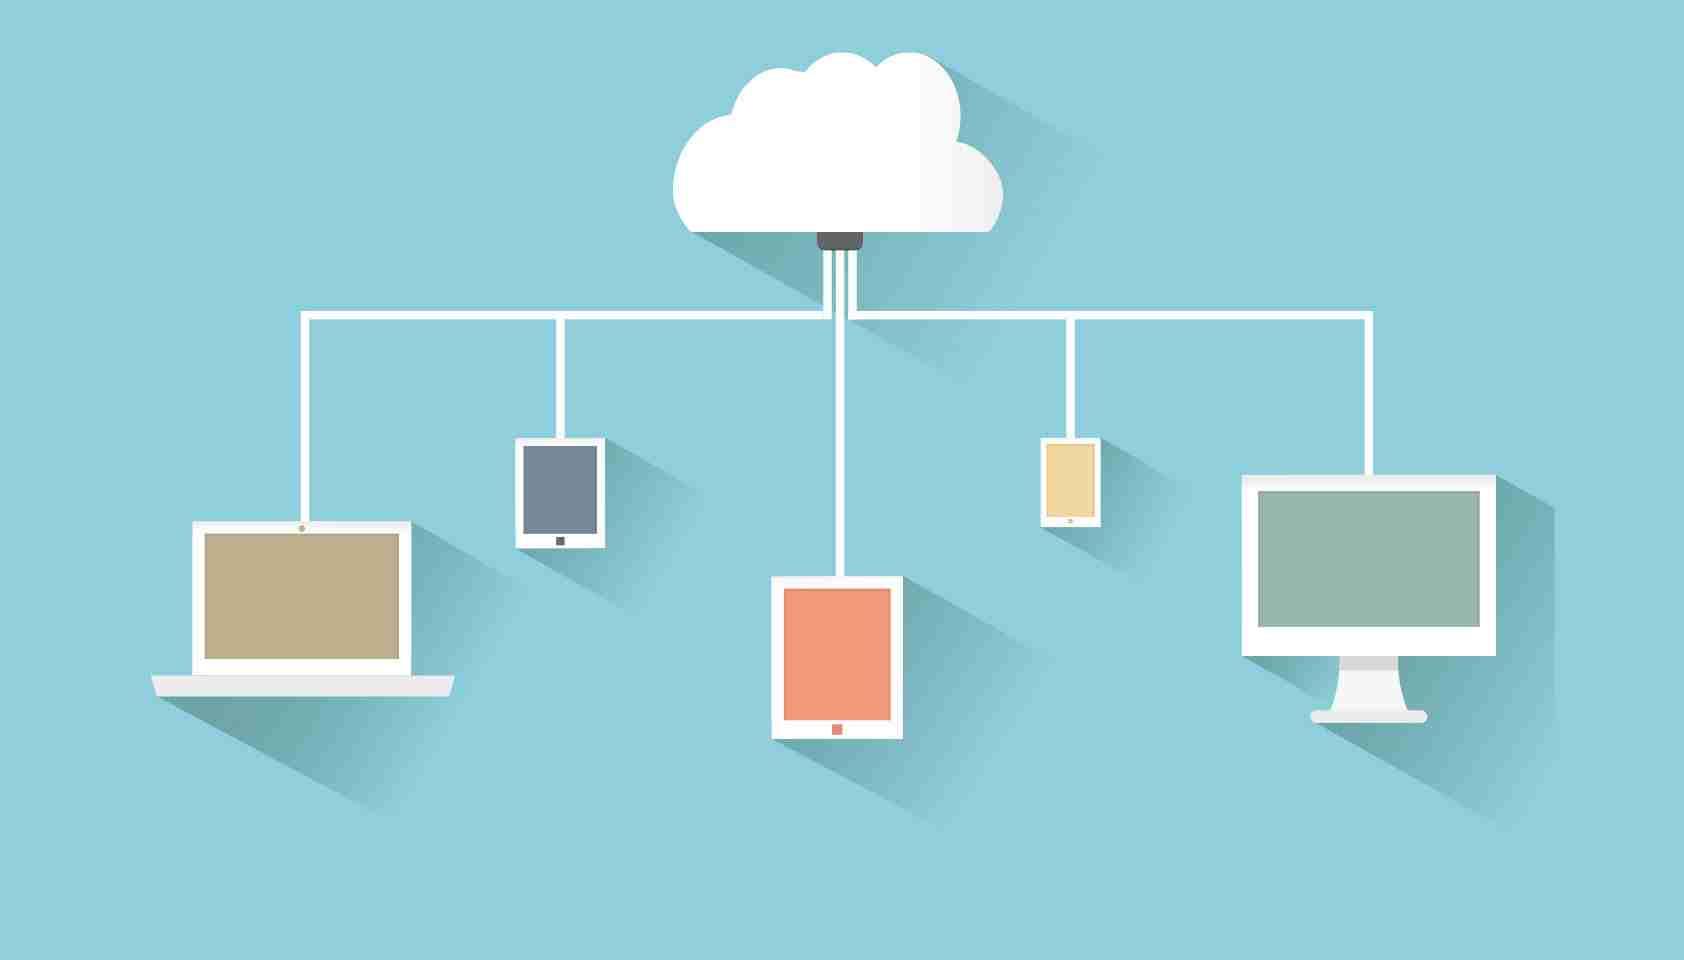 Pasos para migrar tu sitio web con éxito